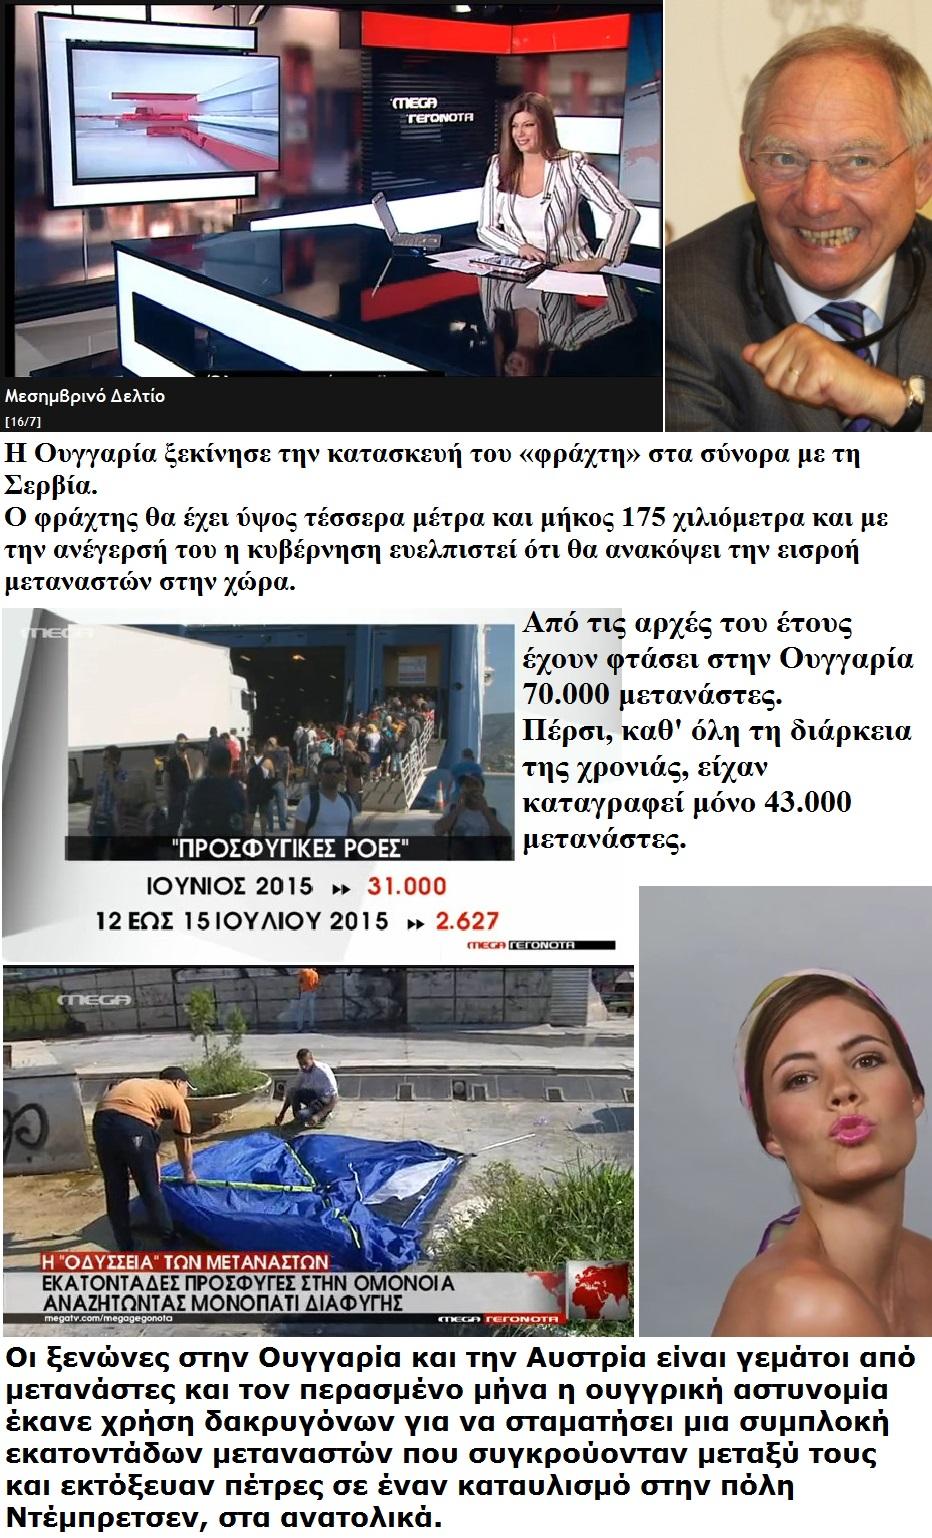 ELLADA OMONIA REFUGEES PARANOMOI METANASTES 01 170715